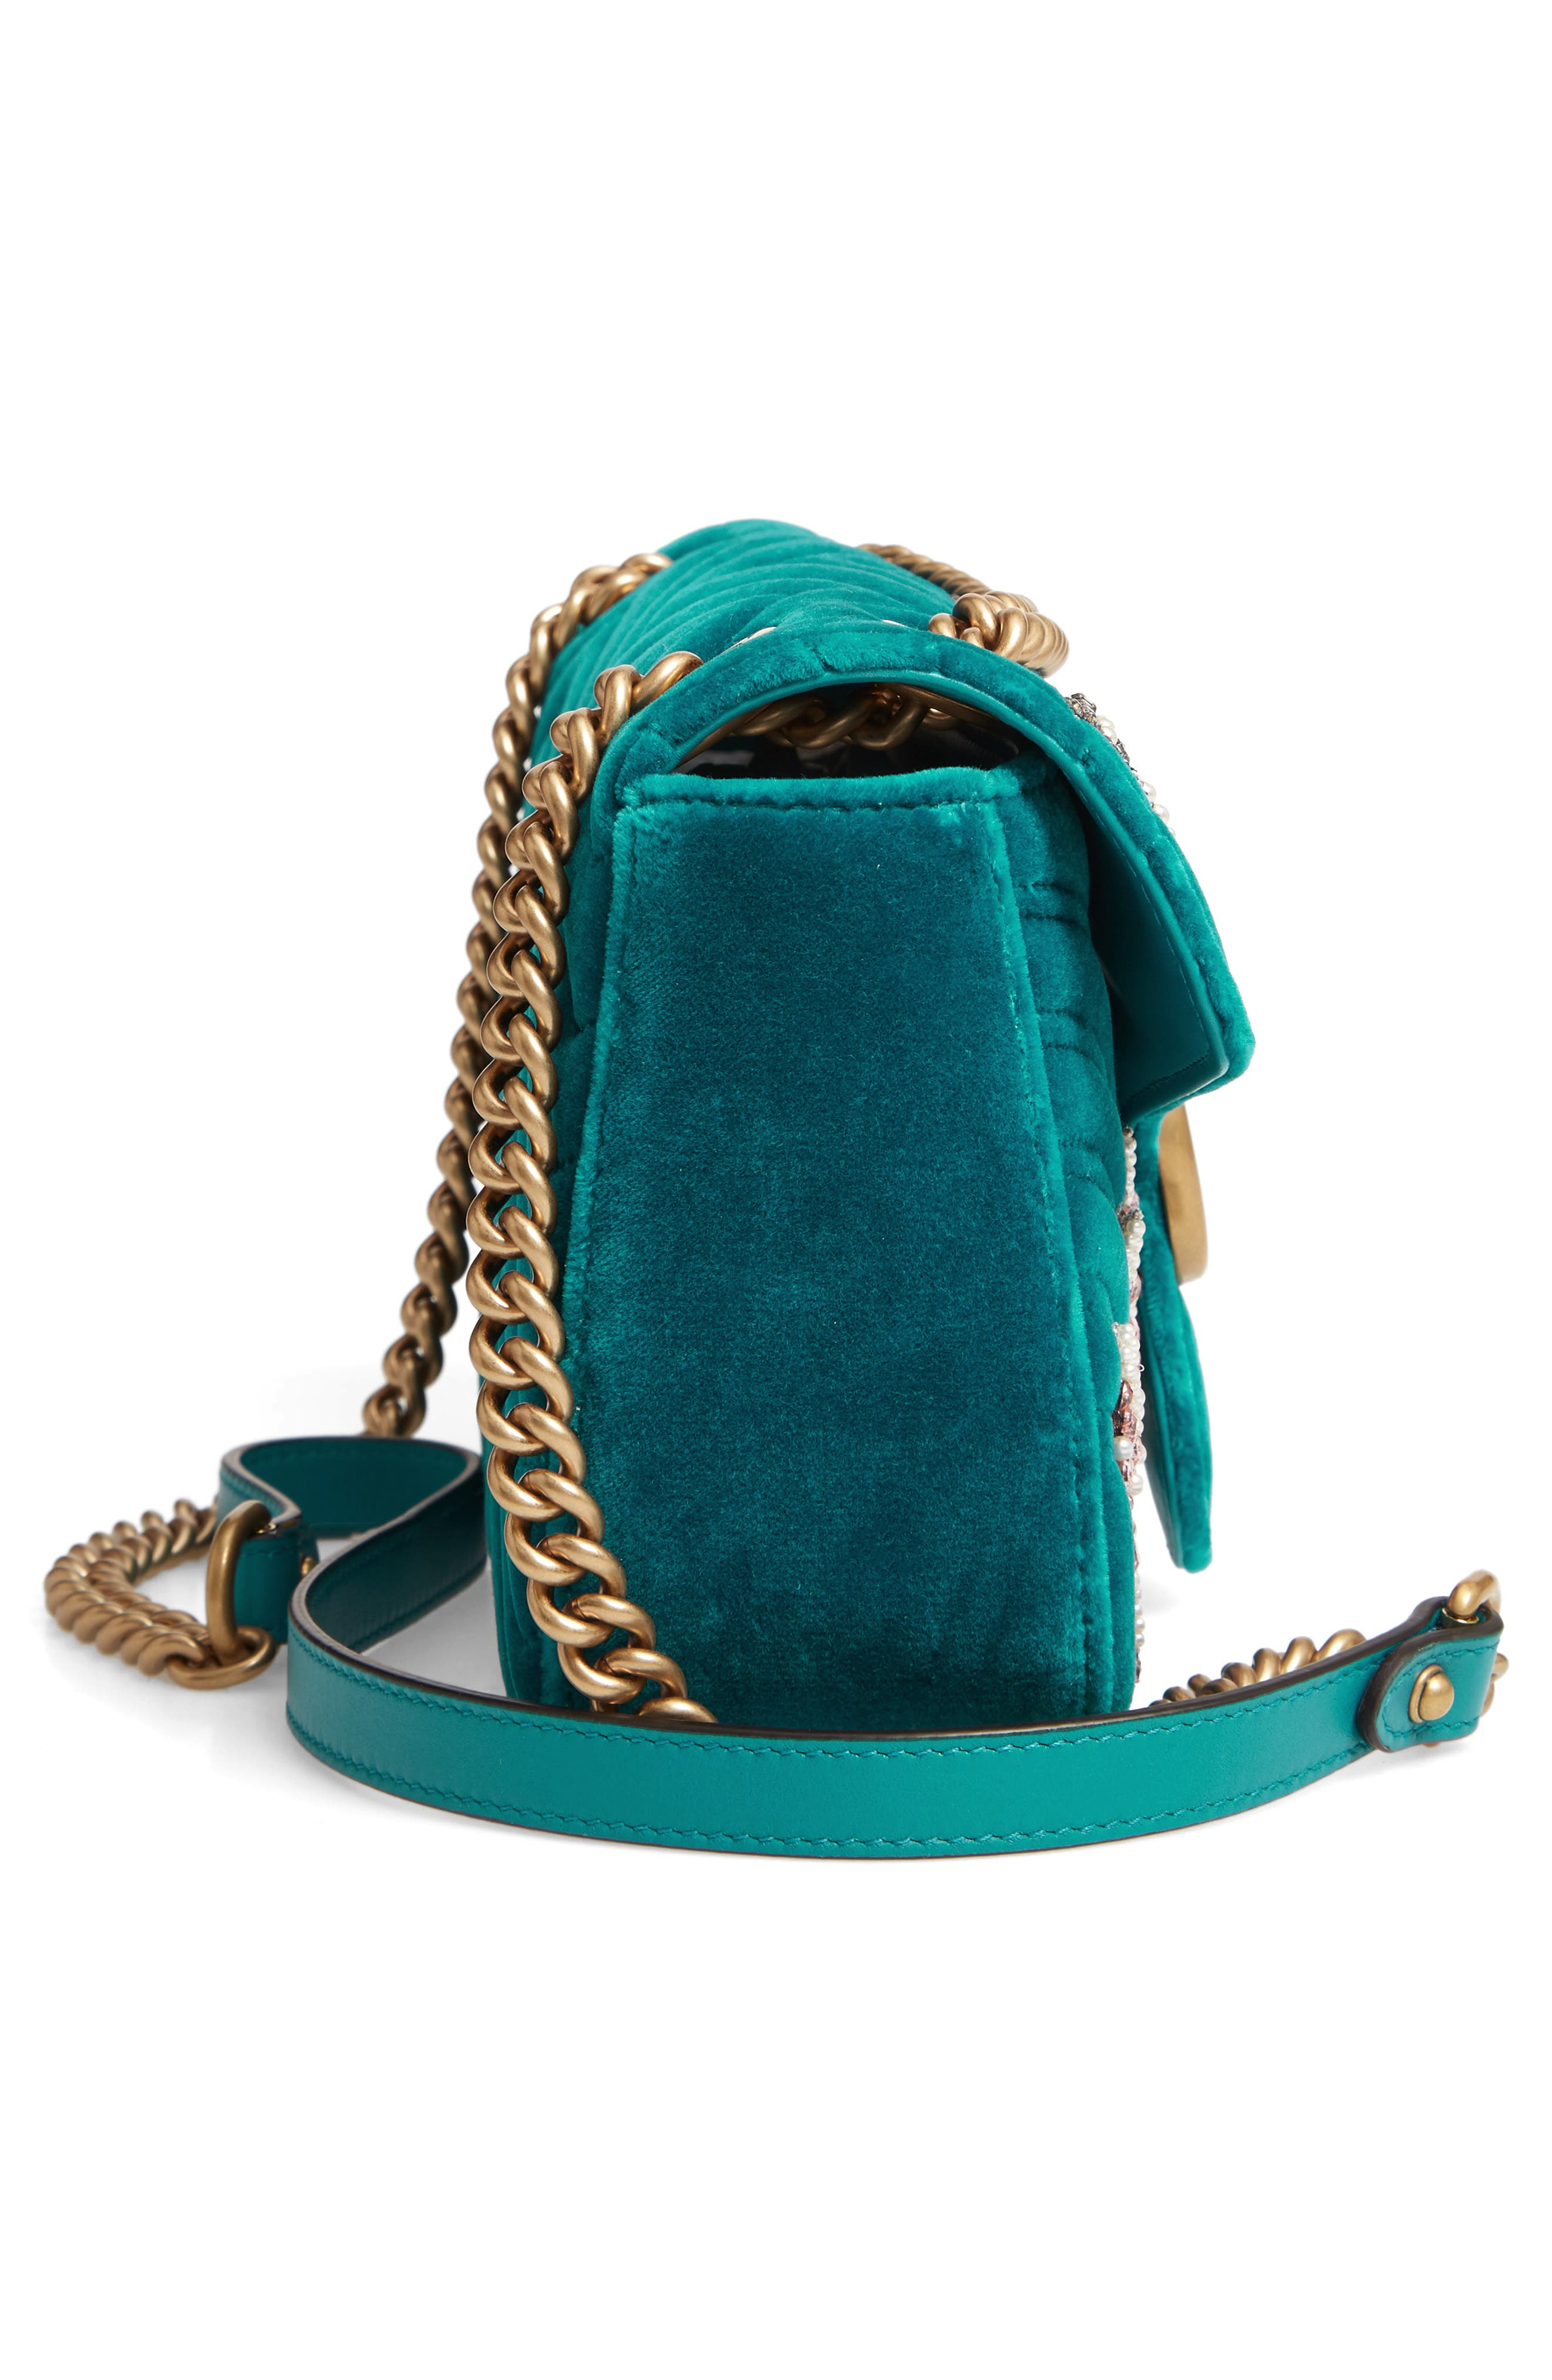 GG Marmont 2.0 Matelassé Velvet Shoulder Bag,                             Alternate thumbnail 5, color,                             440